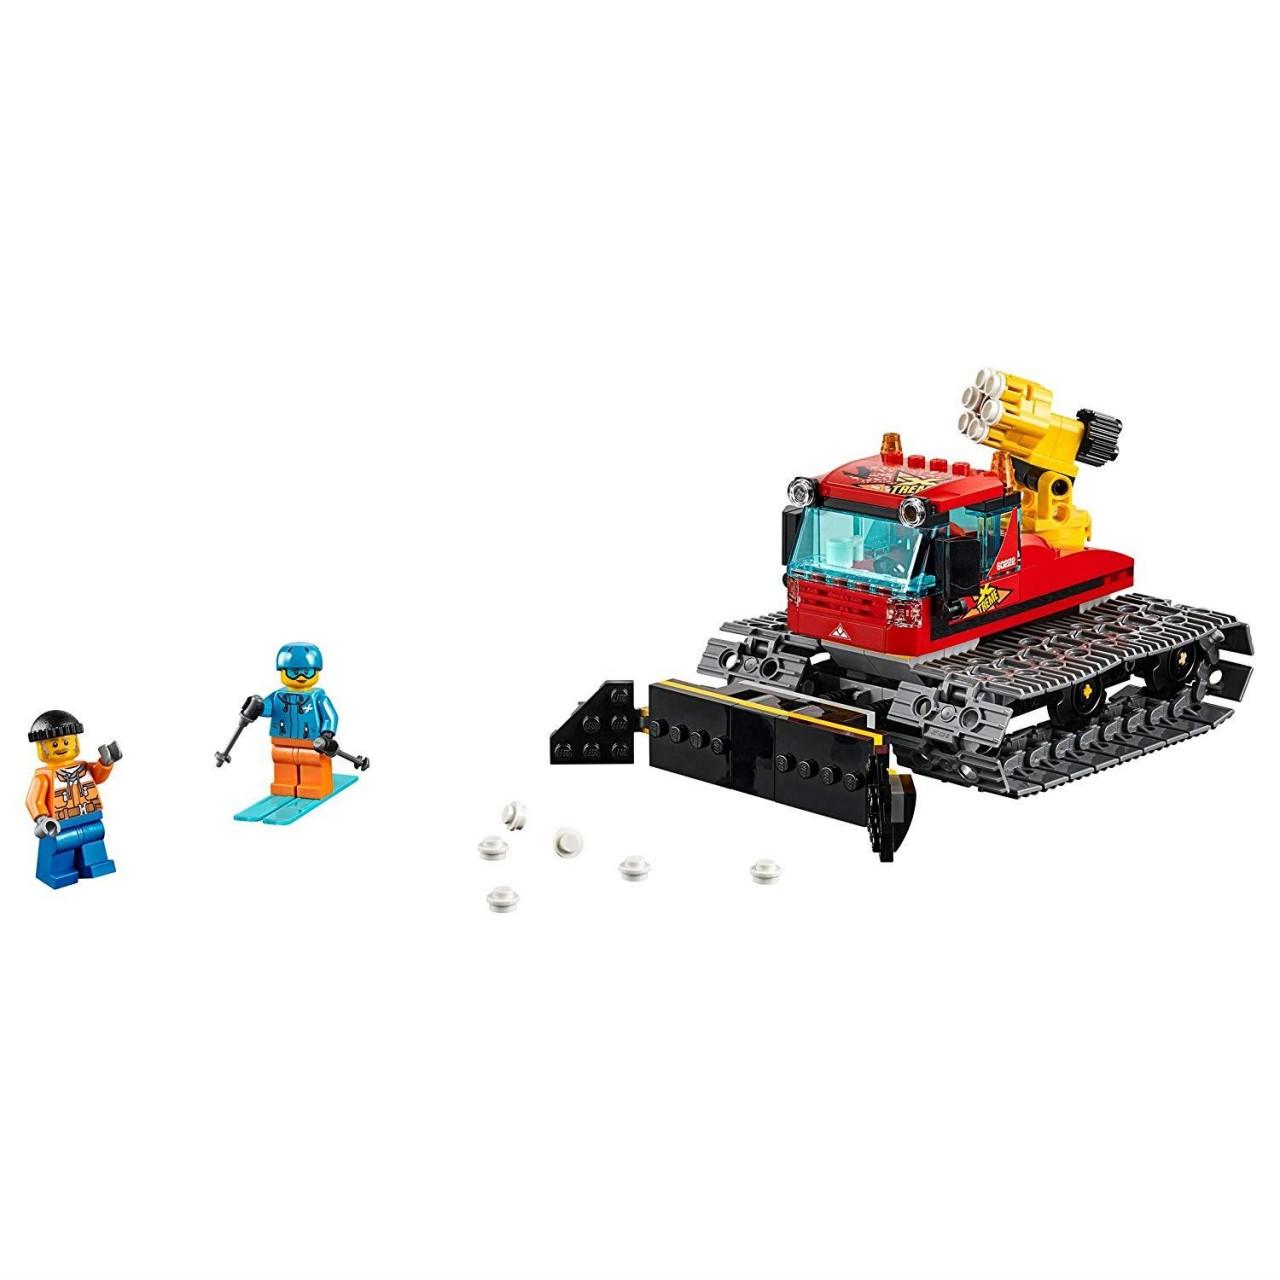 LEGO CITY 60222 Pistenraupe